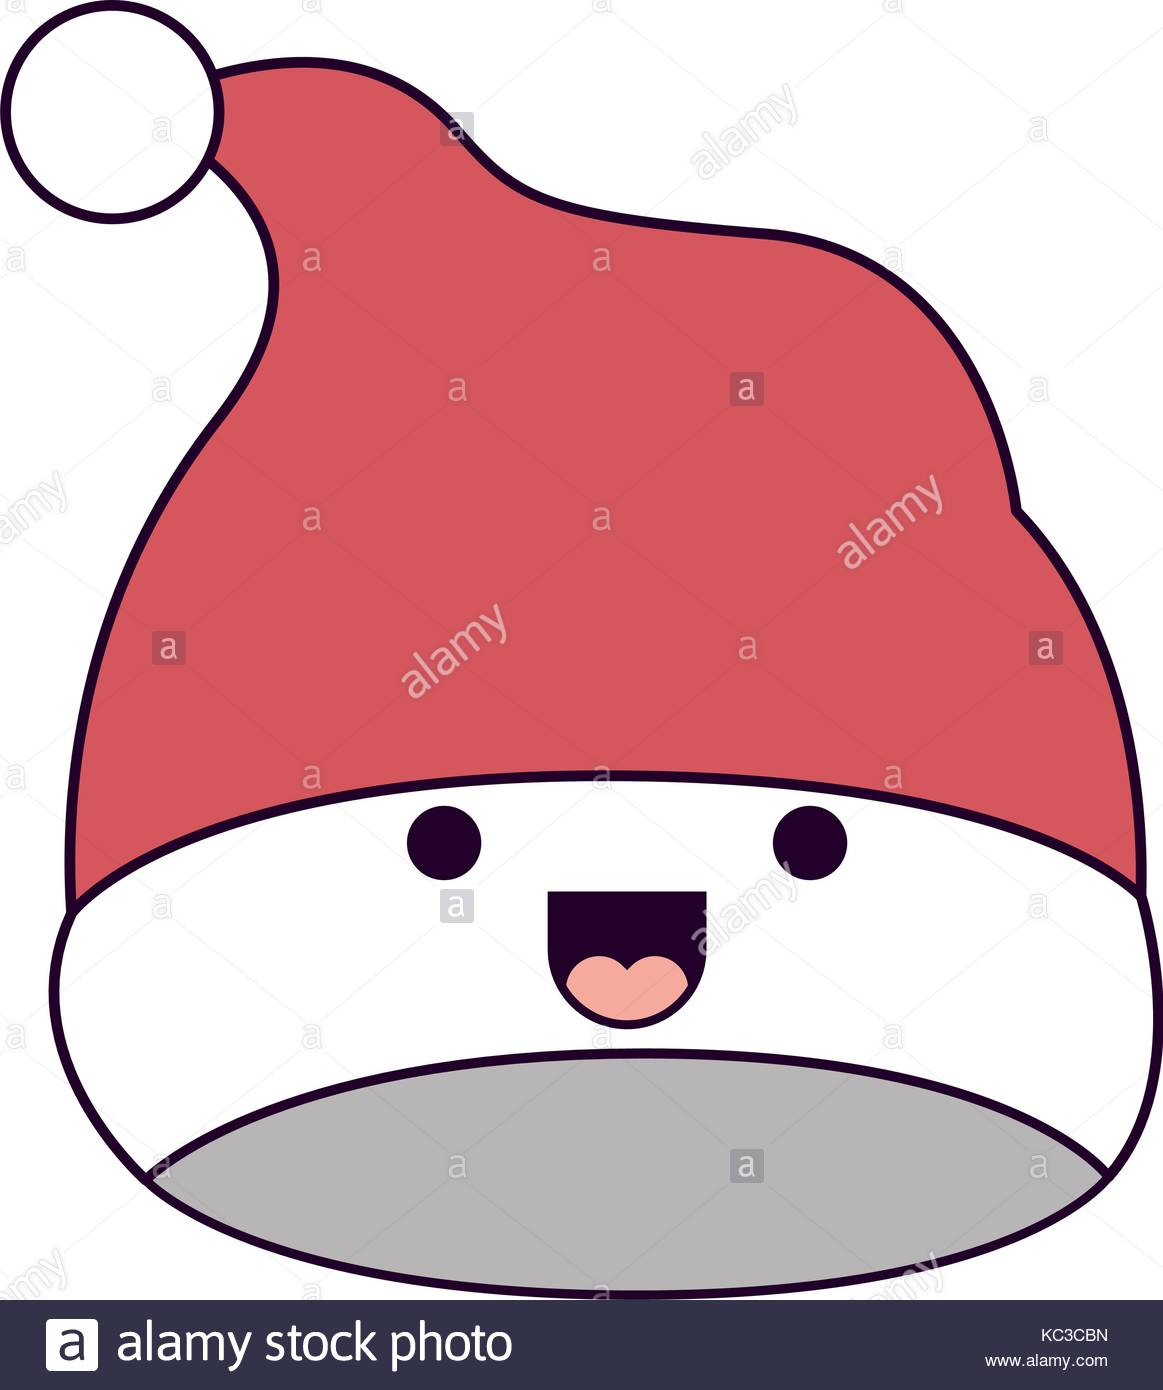 1163x1390 Kawaii Christmas Hat Santa Claus Smiling Expression On Colorful